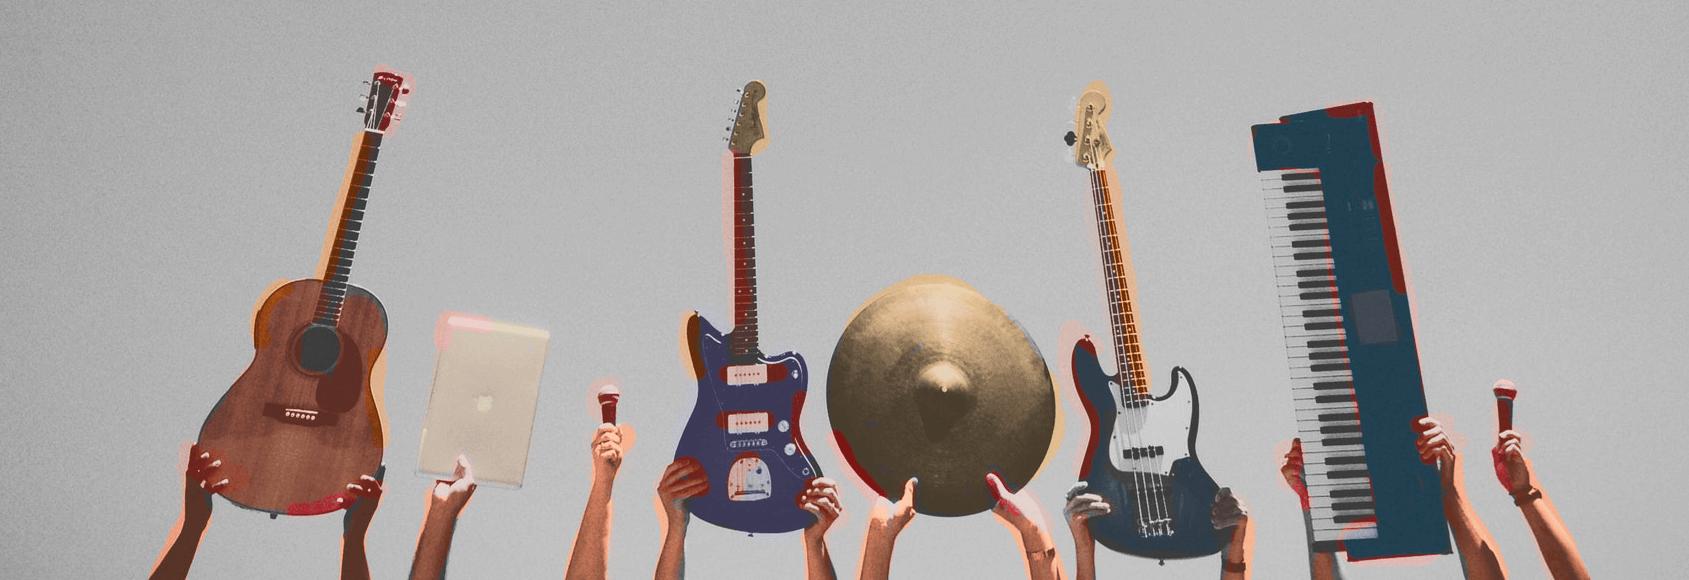 music rock image